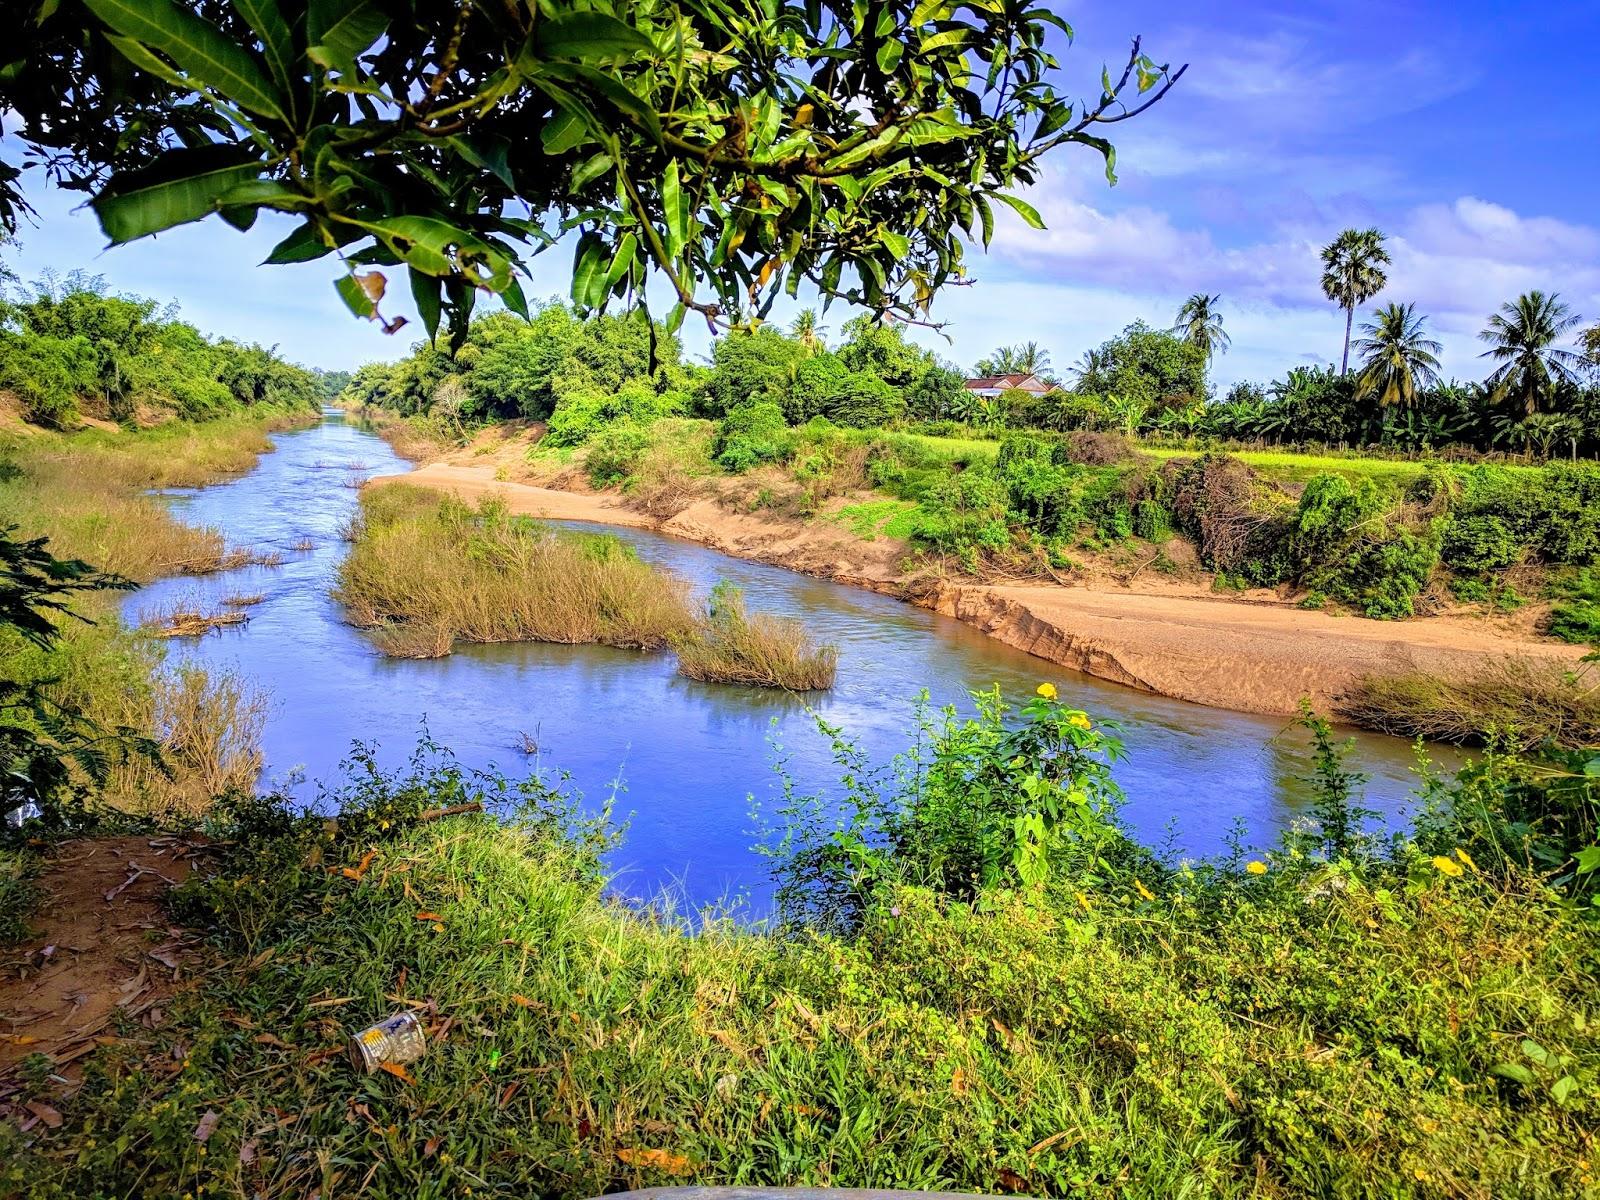 water main source of life